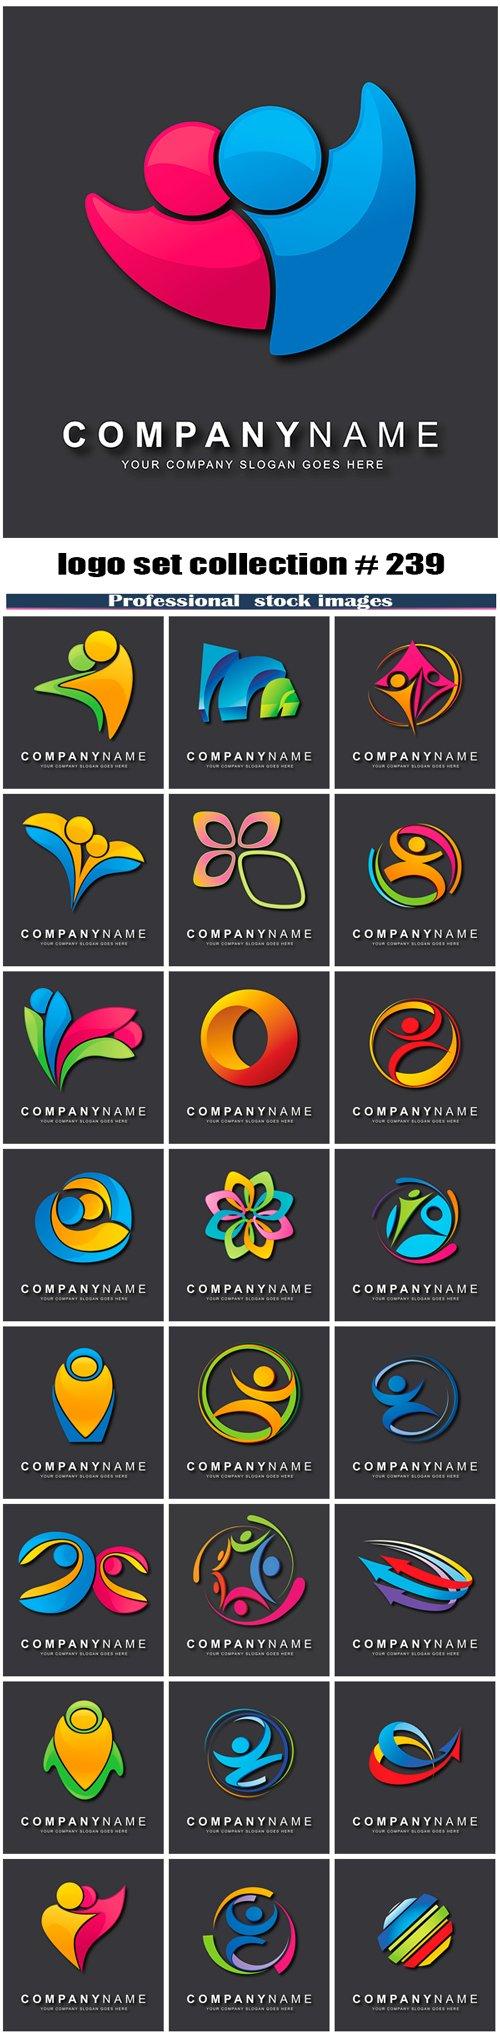 logo set collection # 239